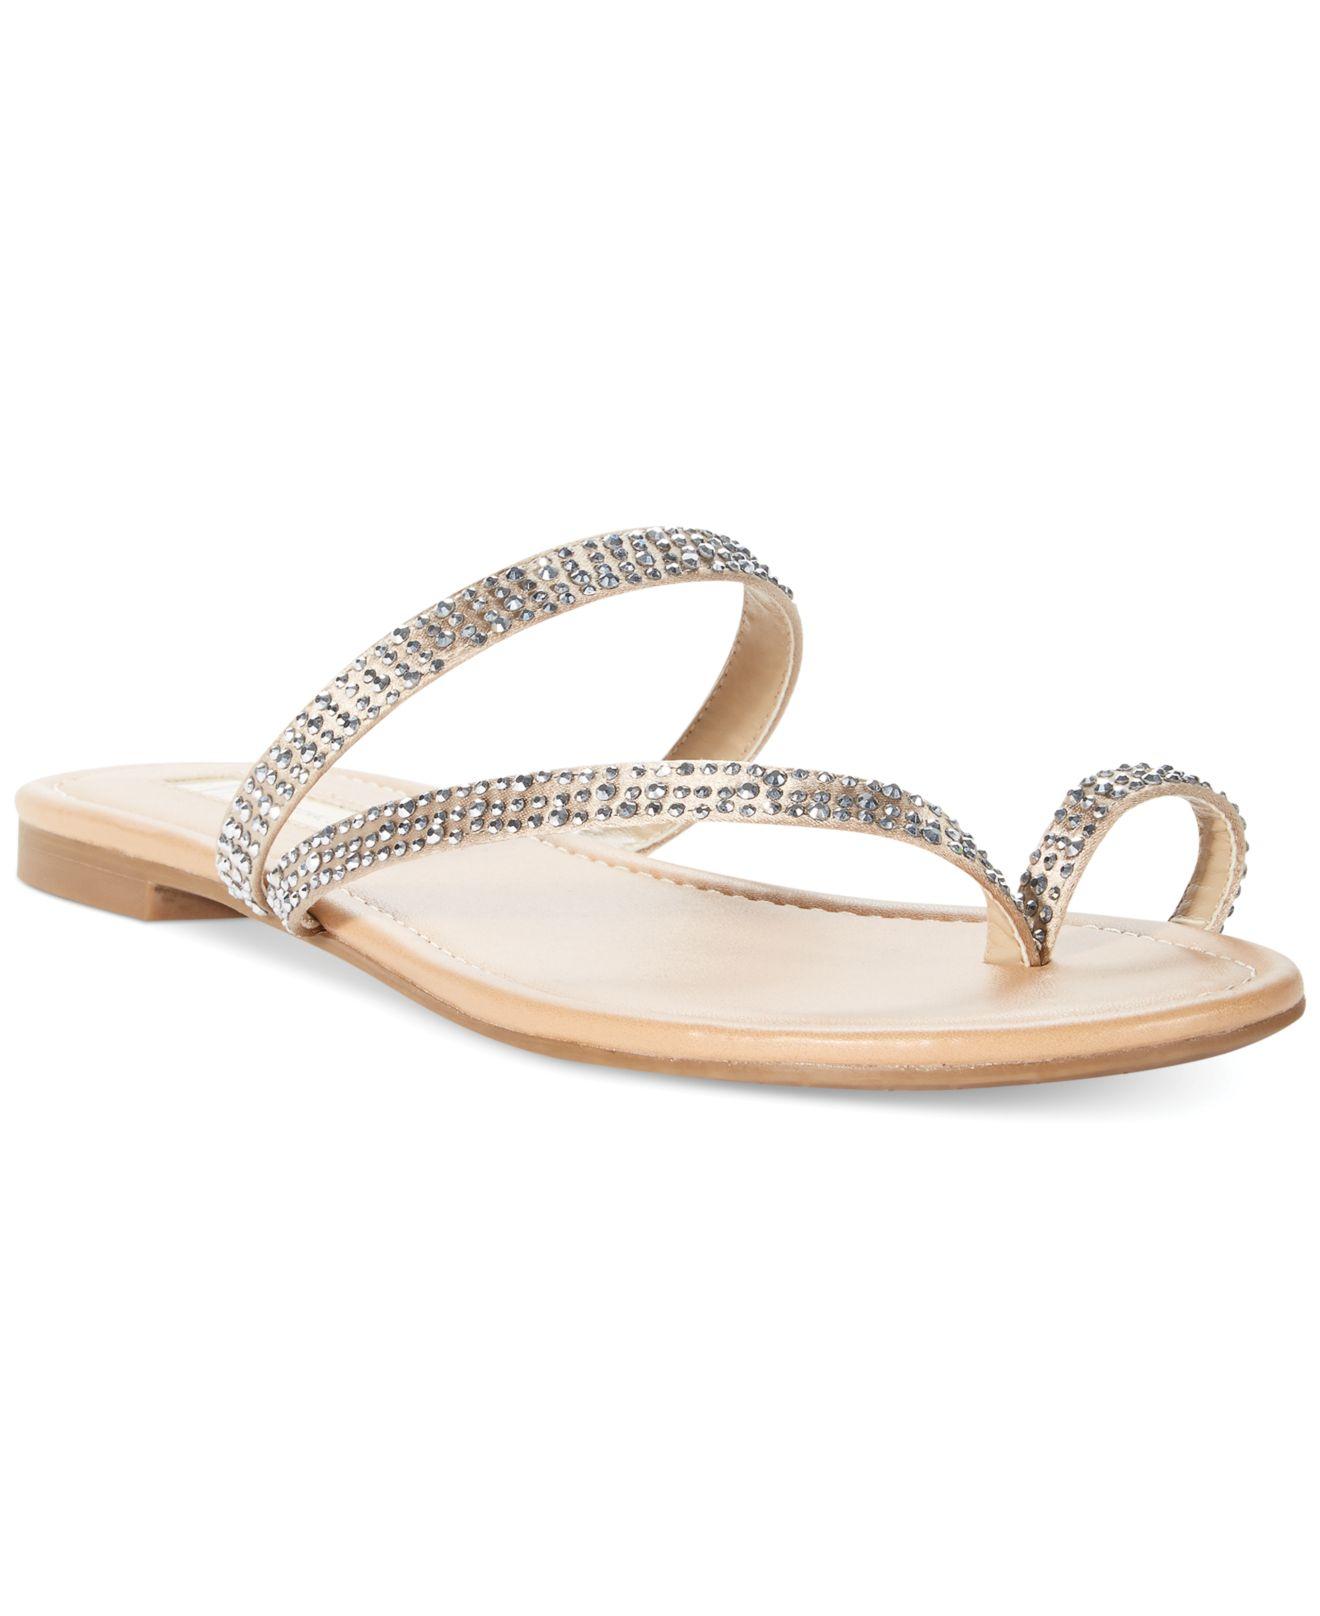 Dolce Vita Shoes Macy S